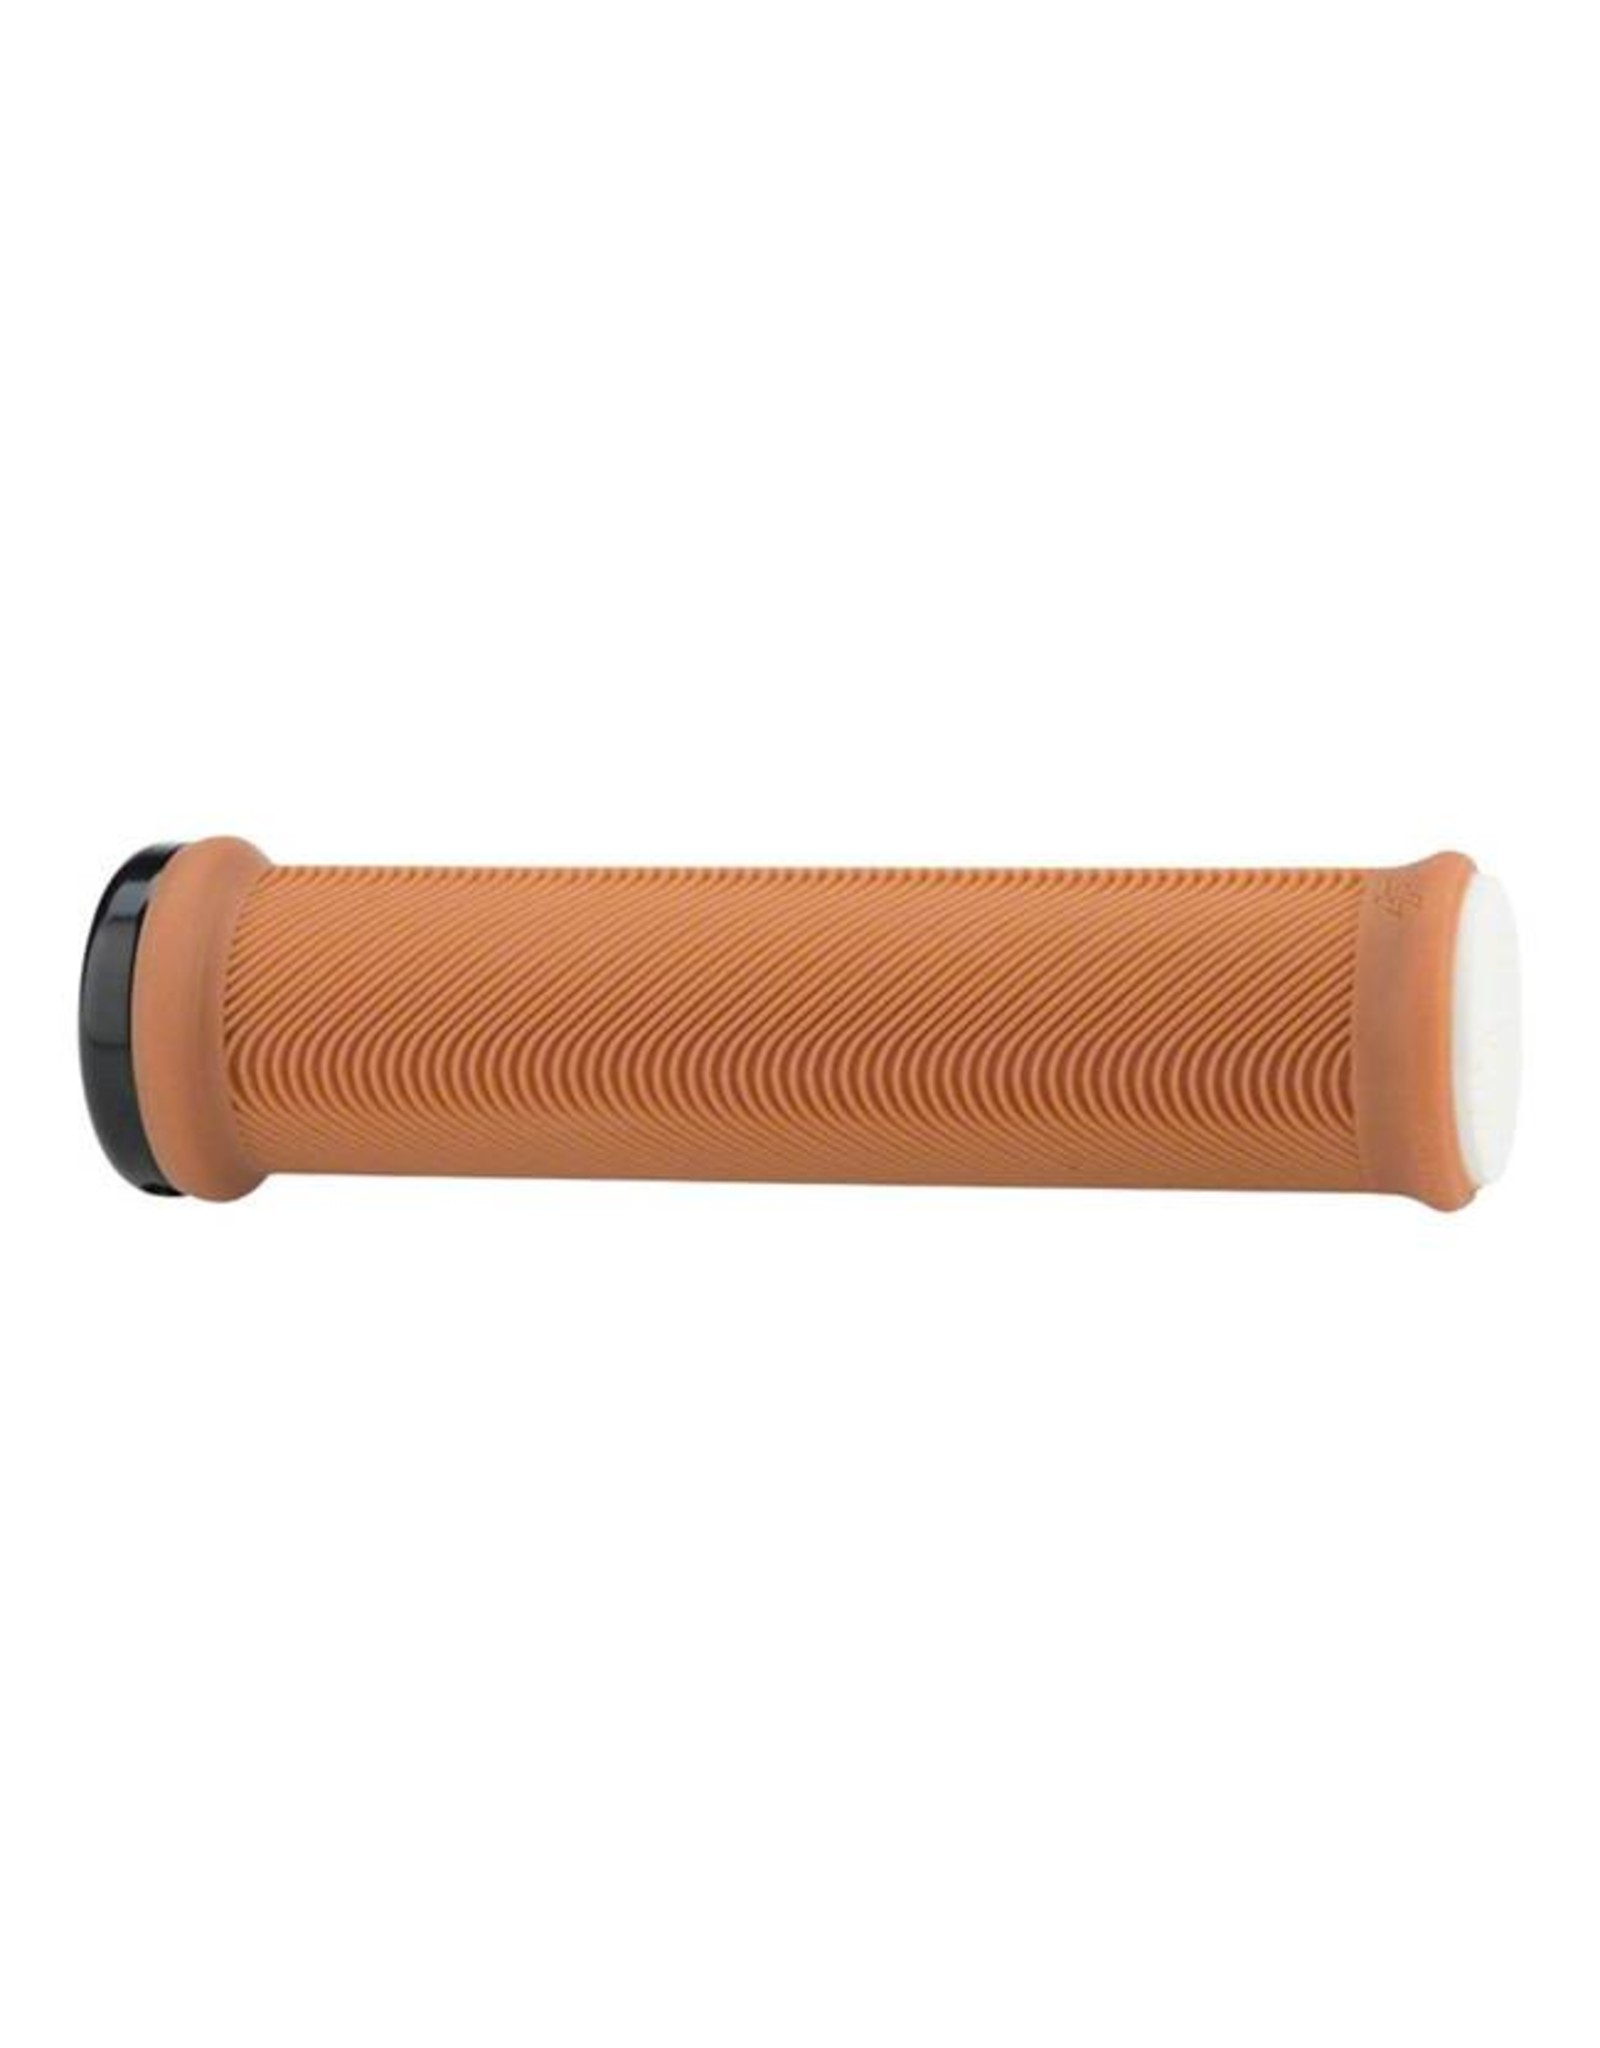 ODI ODI Sensus Lite v2.1 Lock-On Grips Gum/White W/Black Clamps